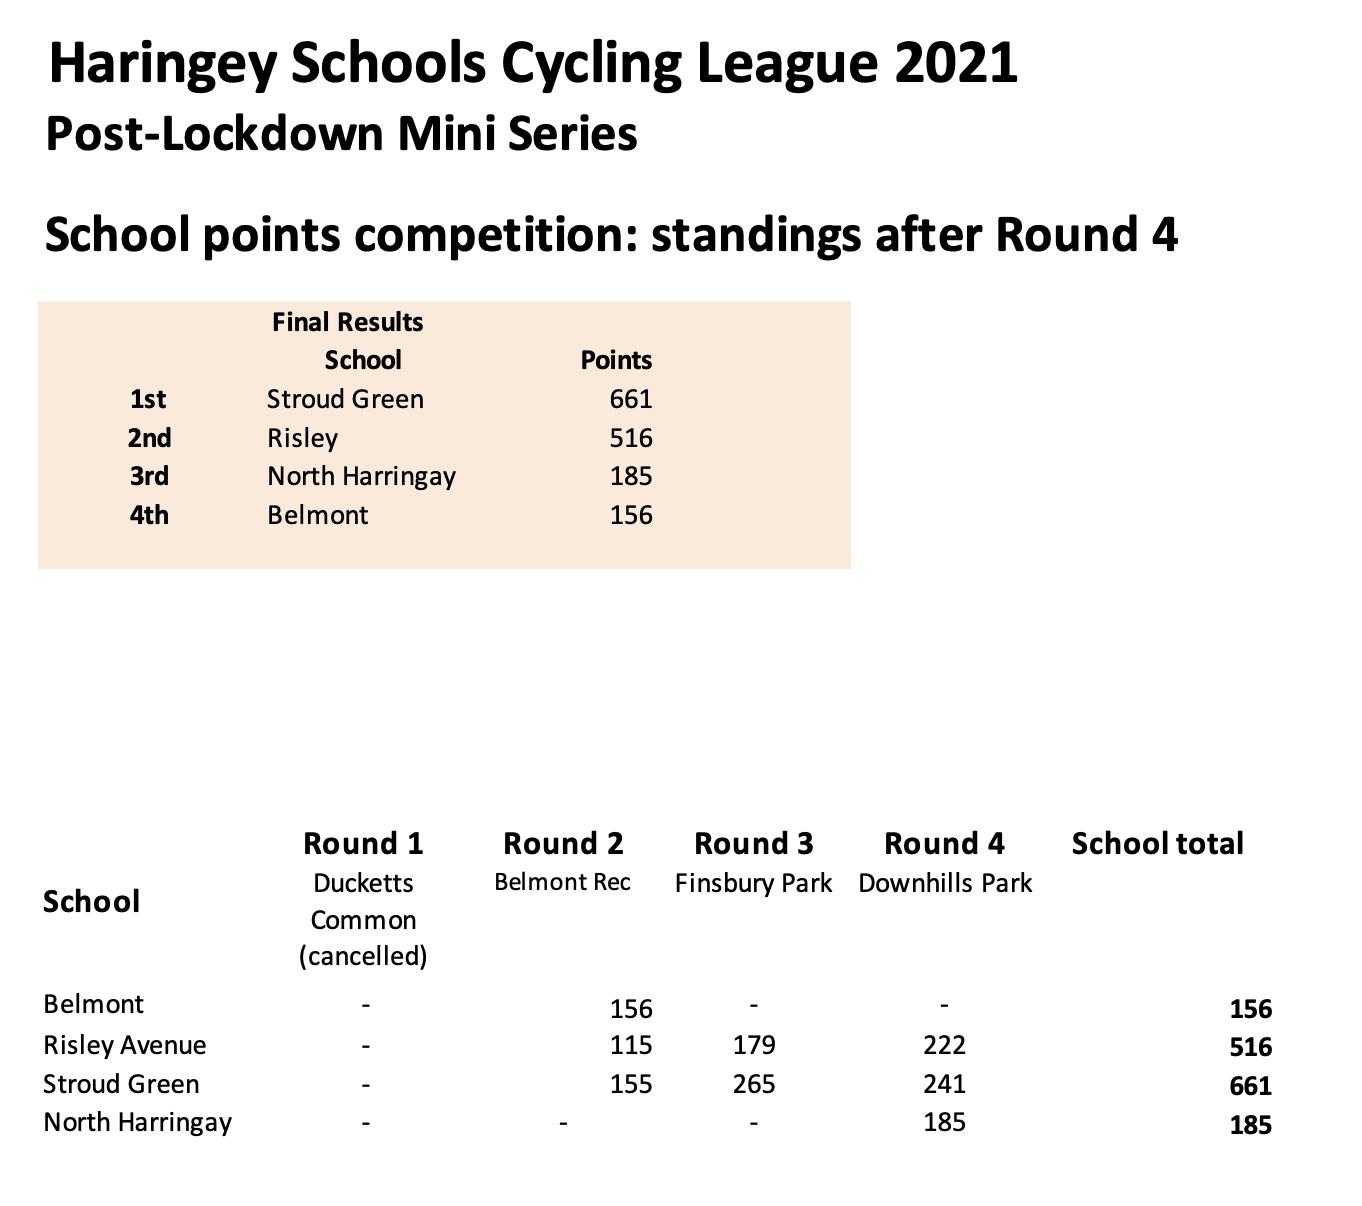 Round 4 standings